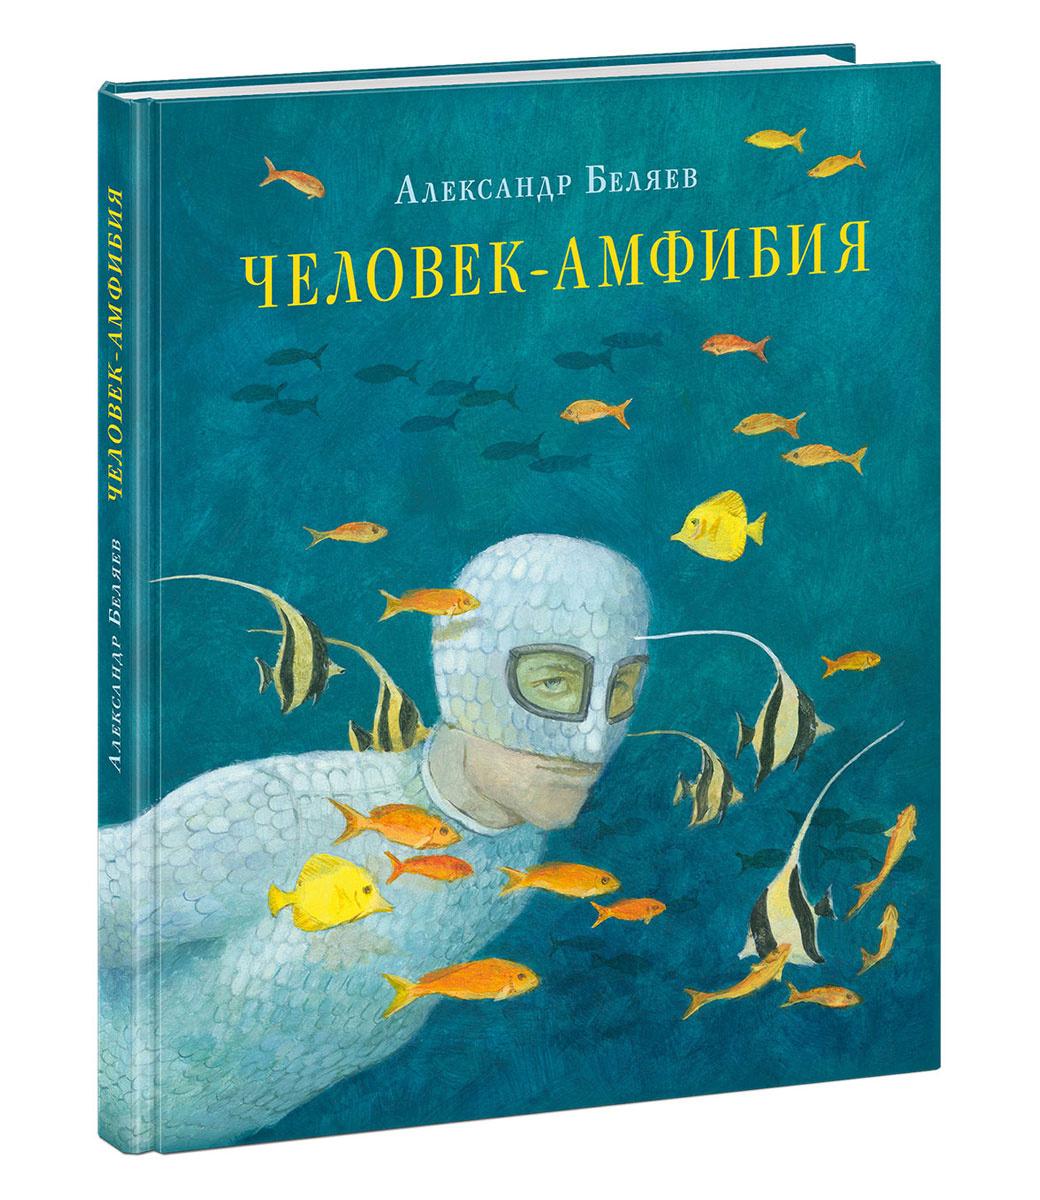 Человек-амфибия   Беляев Александр Романович #1